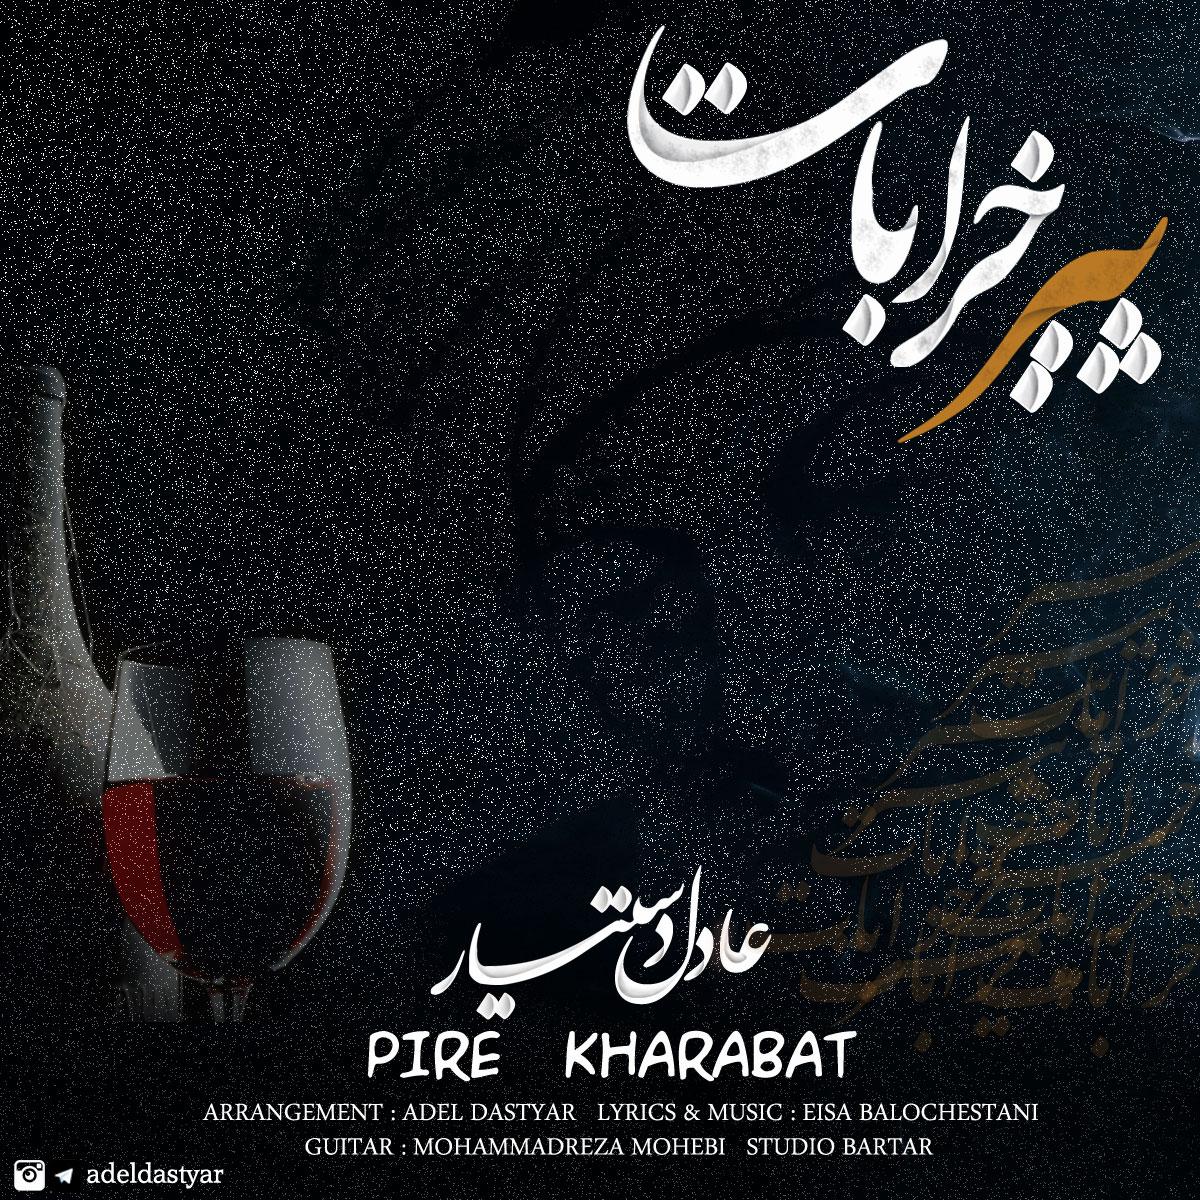 Adel Dastyar – Pire Kharabat